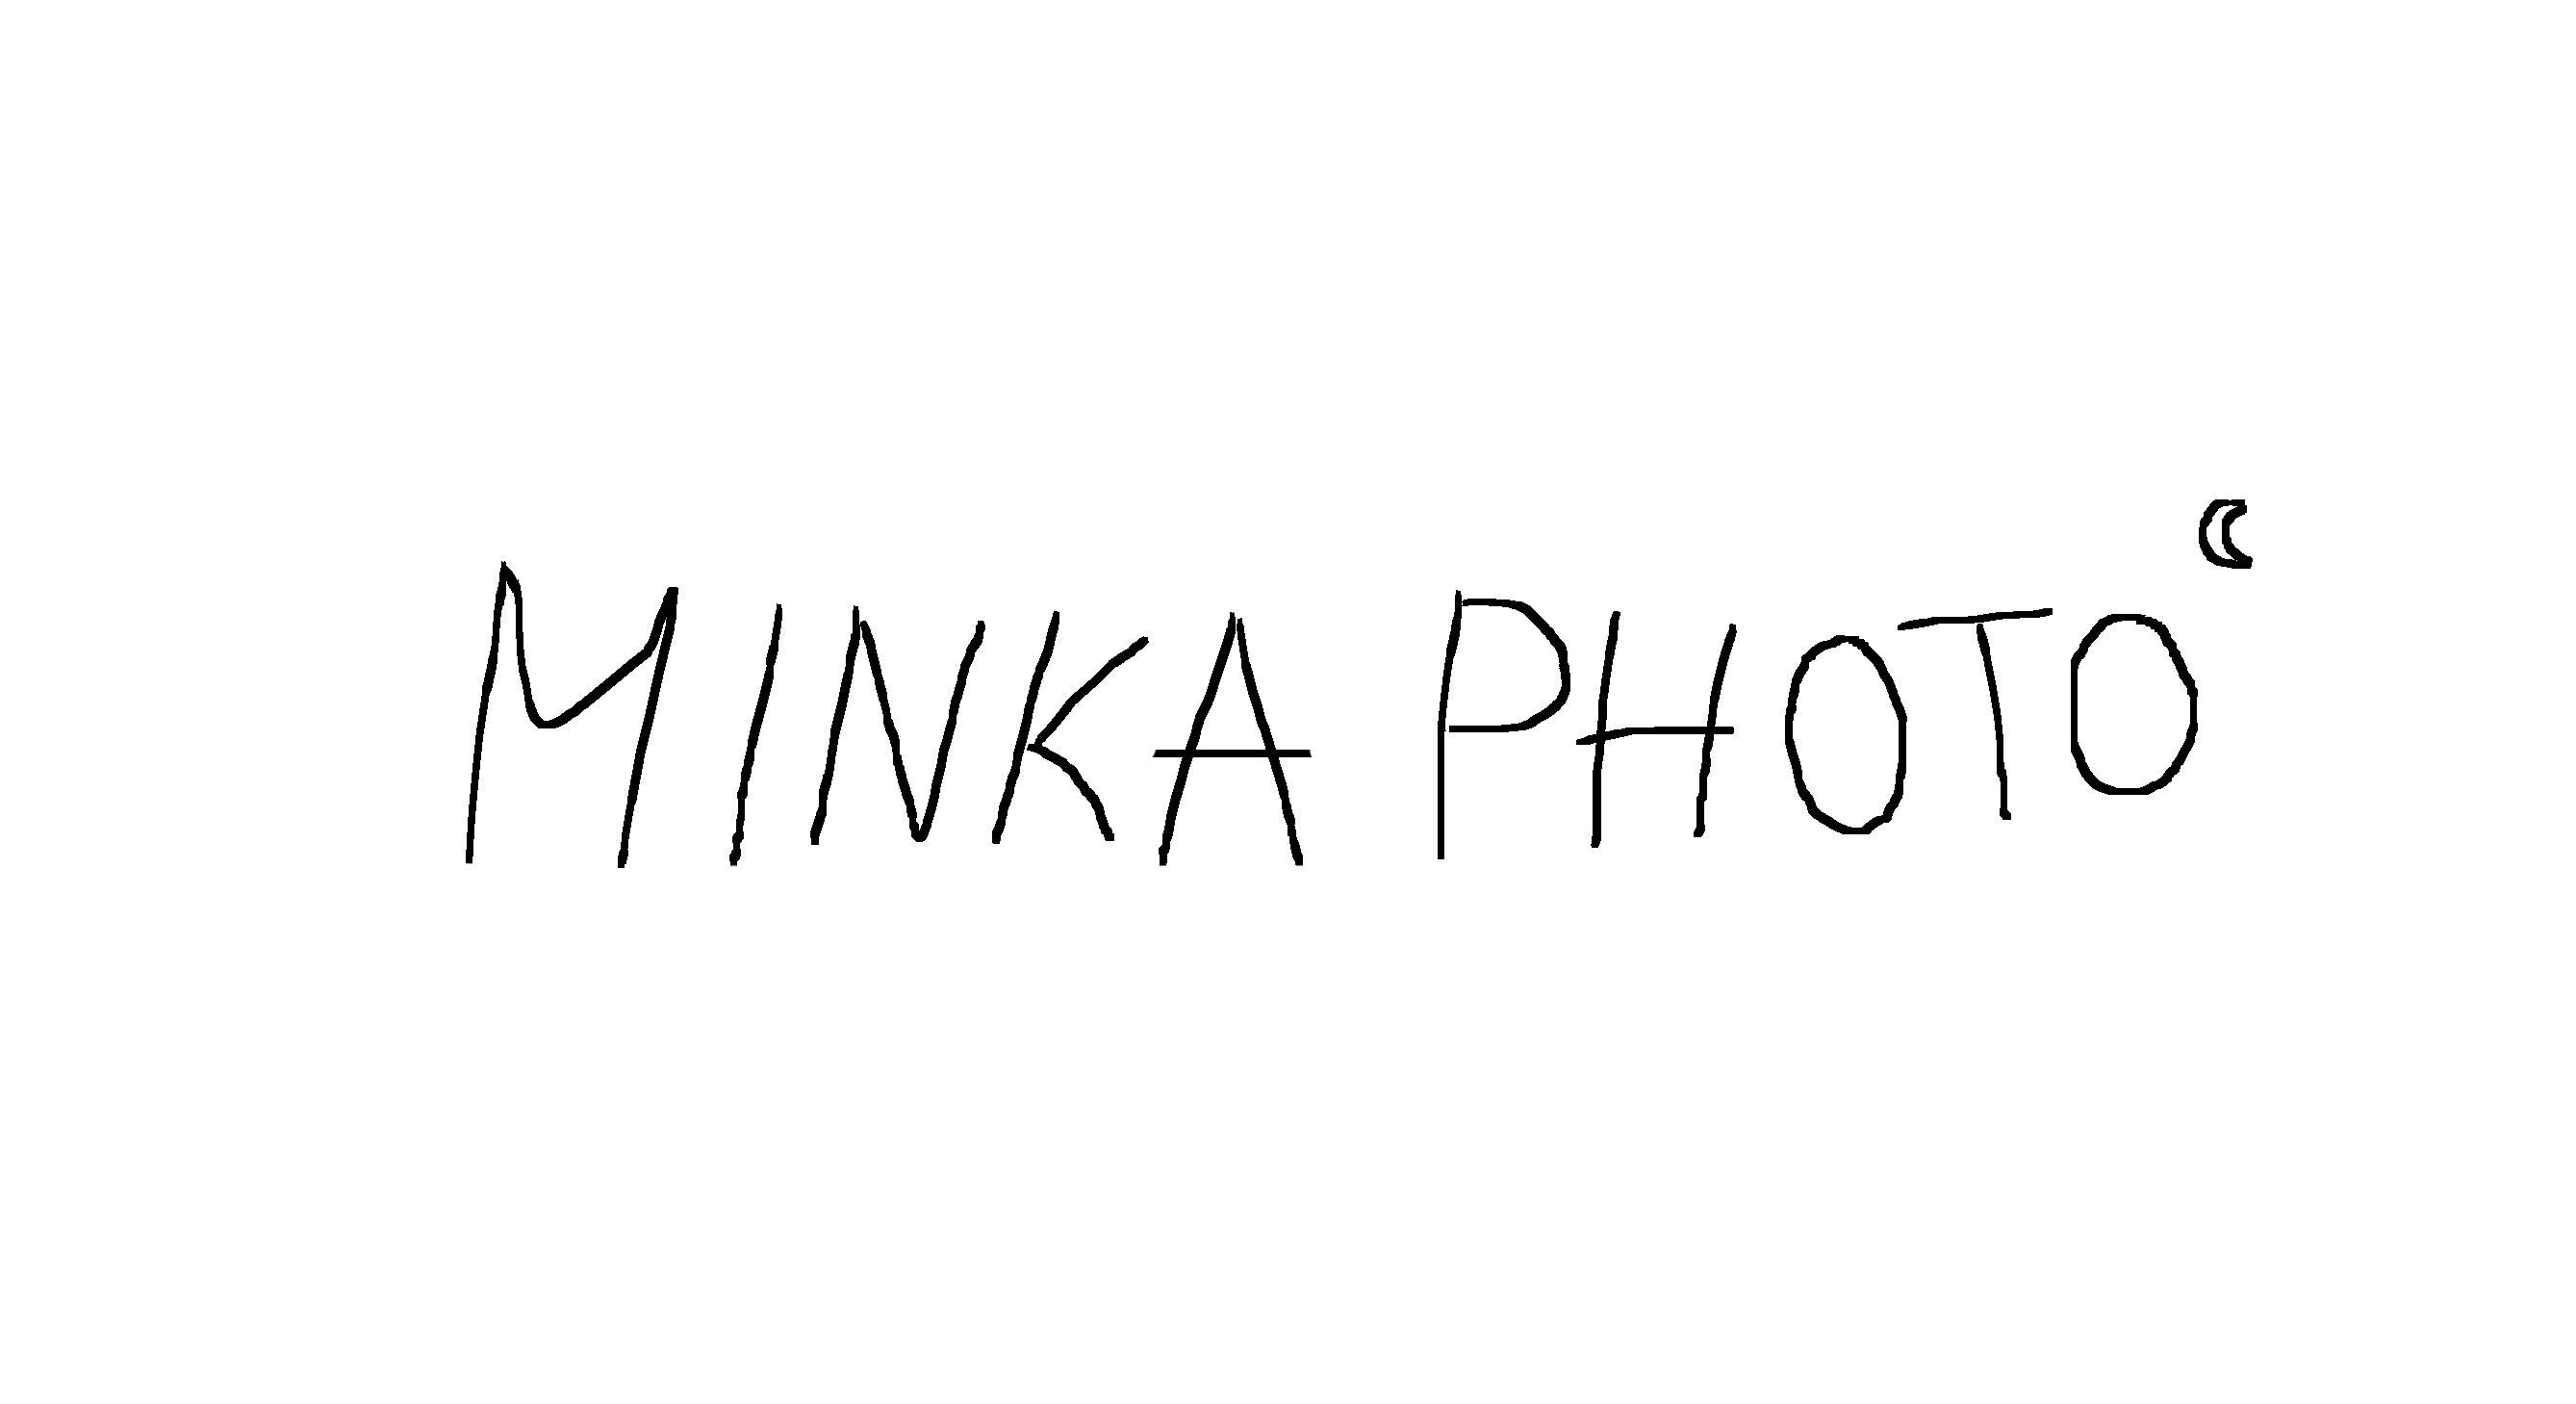 Marina Danic's Signature